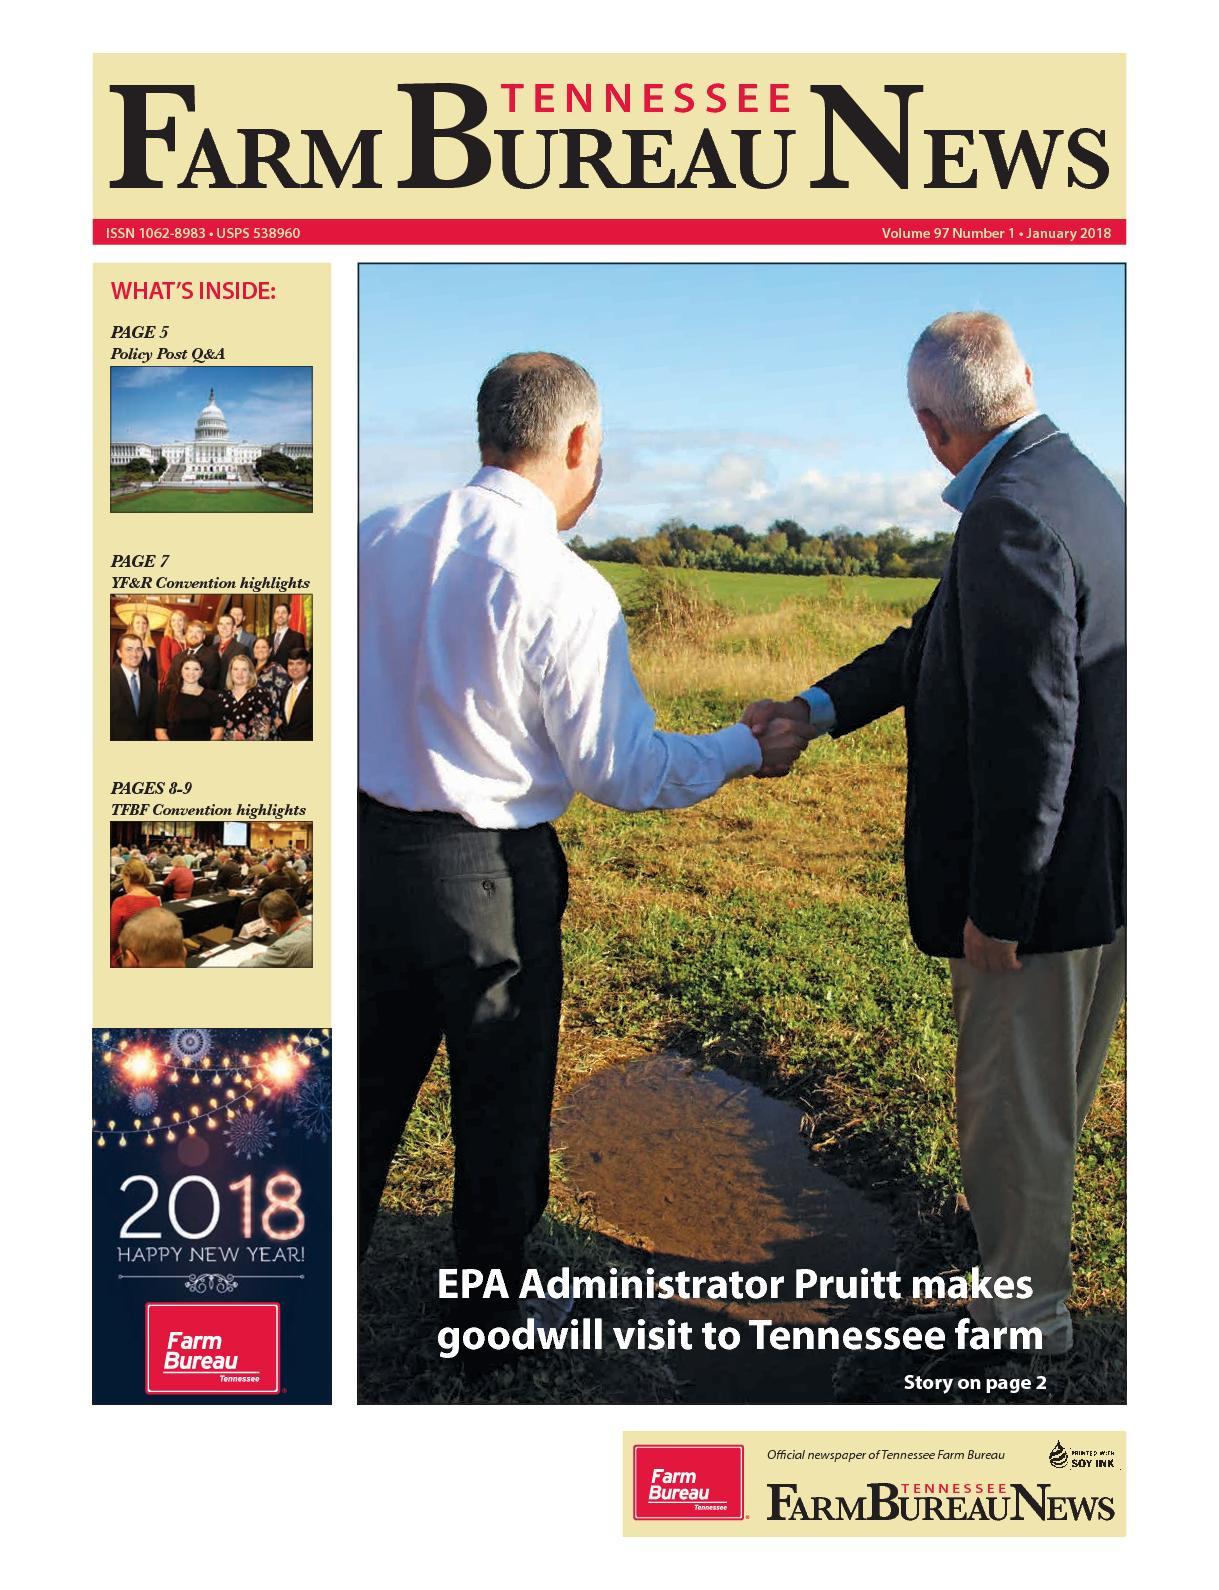 American Pickers Pikeville Nc calaméo - january 2018: tn farm bureau news